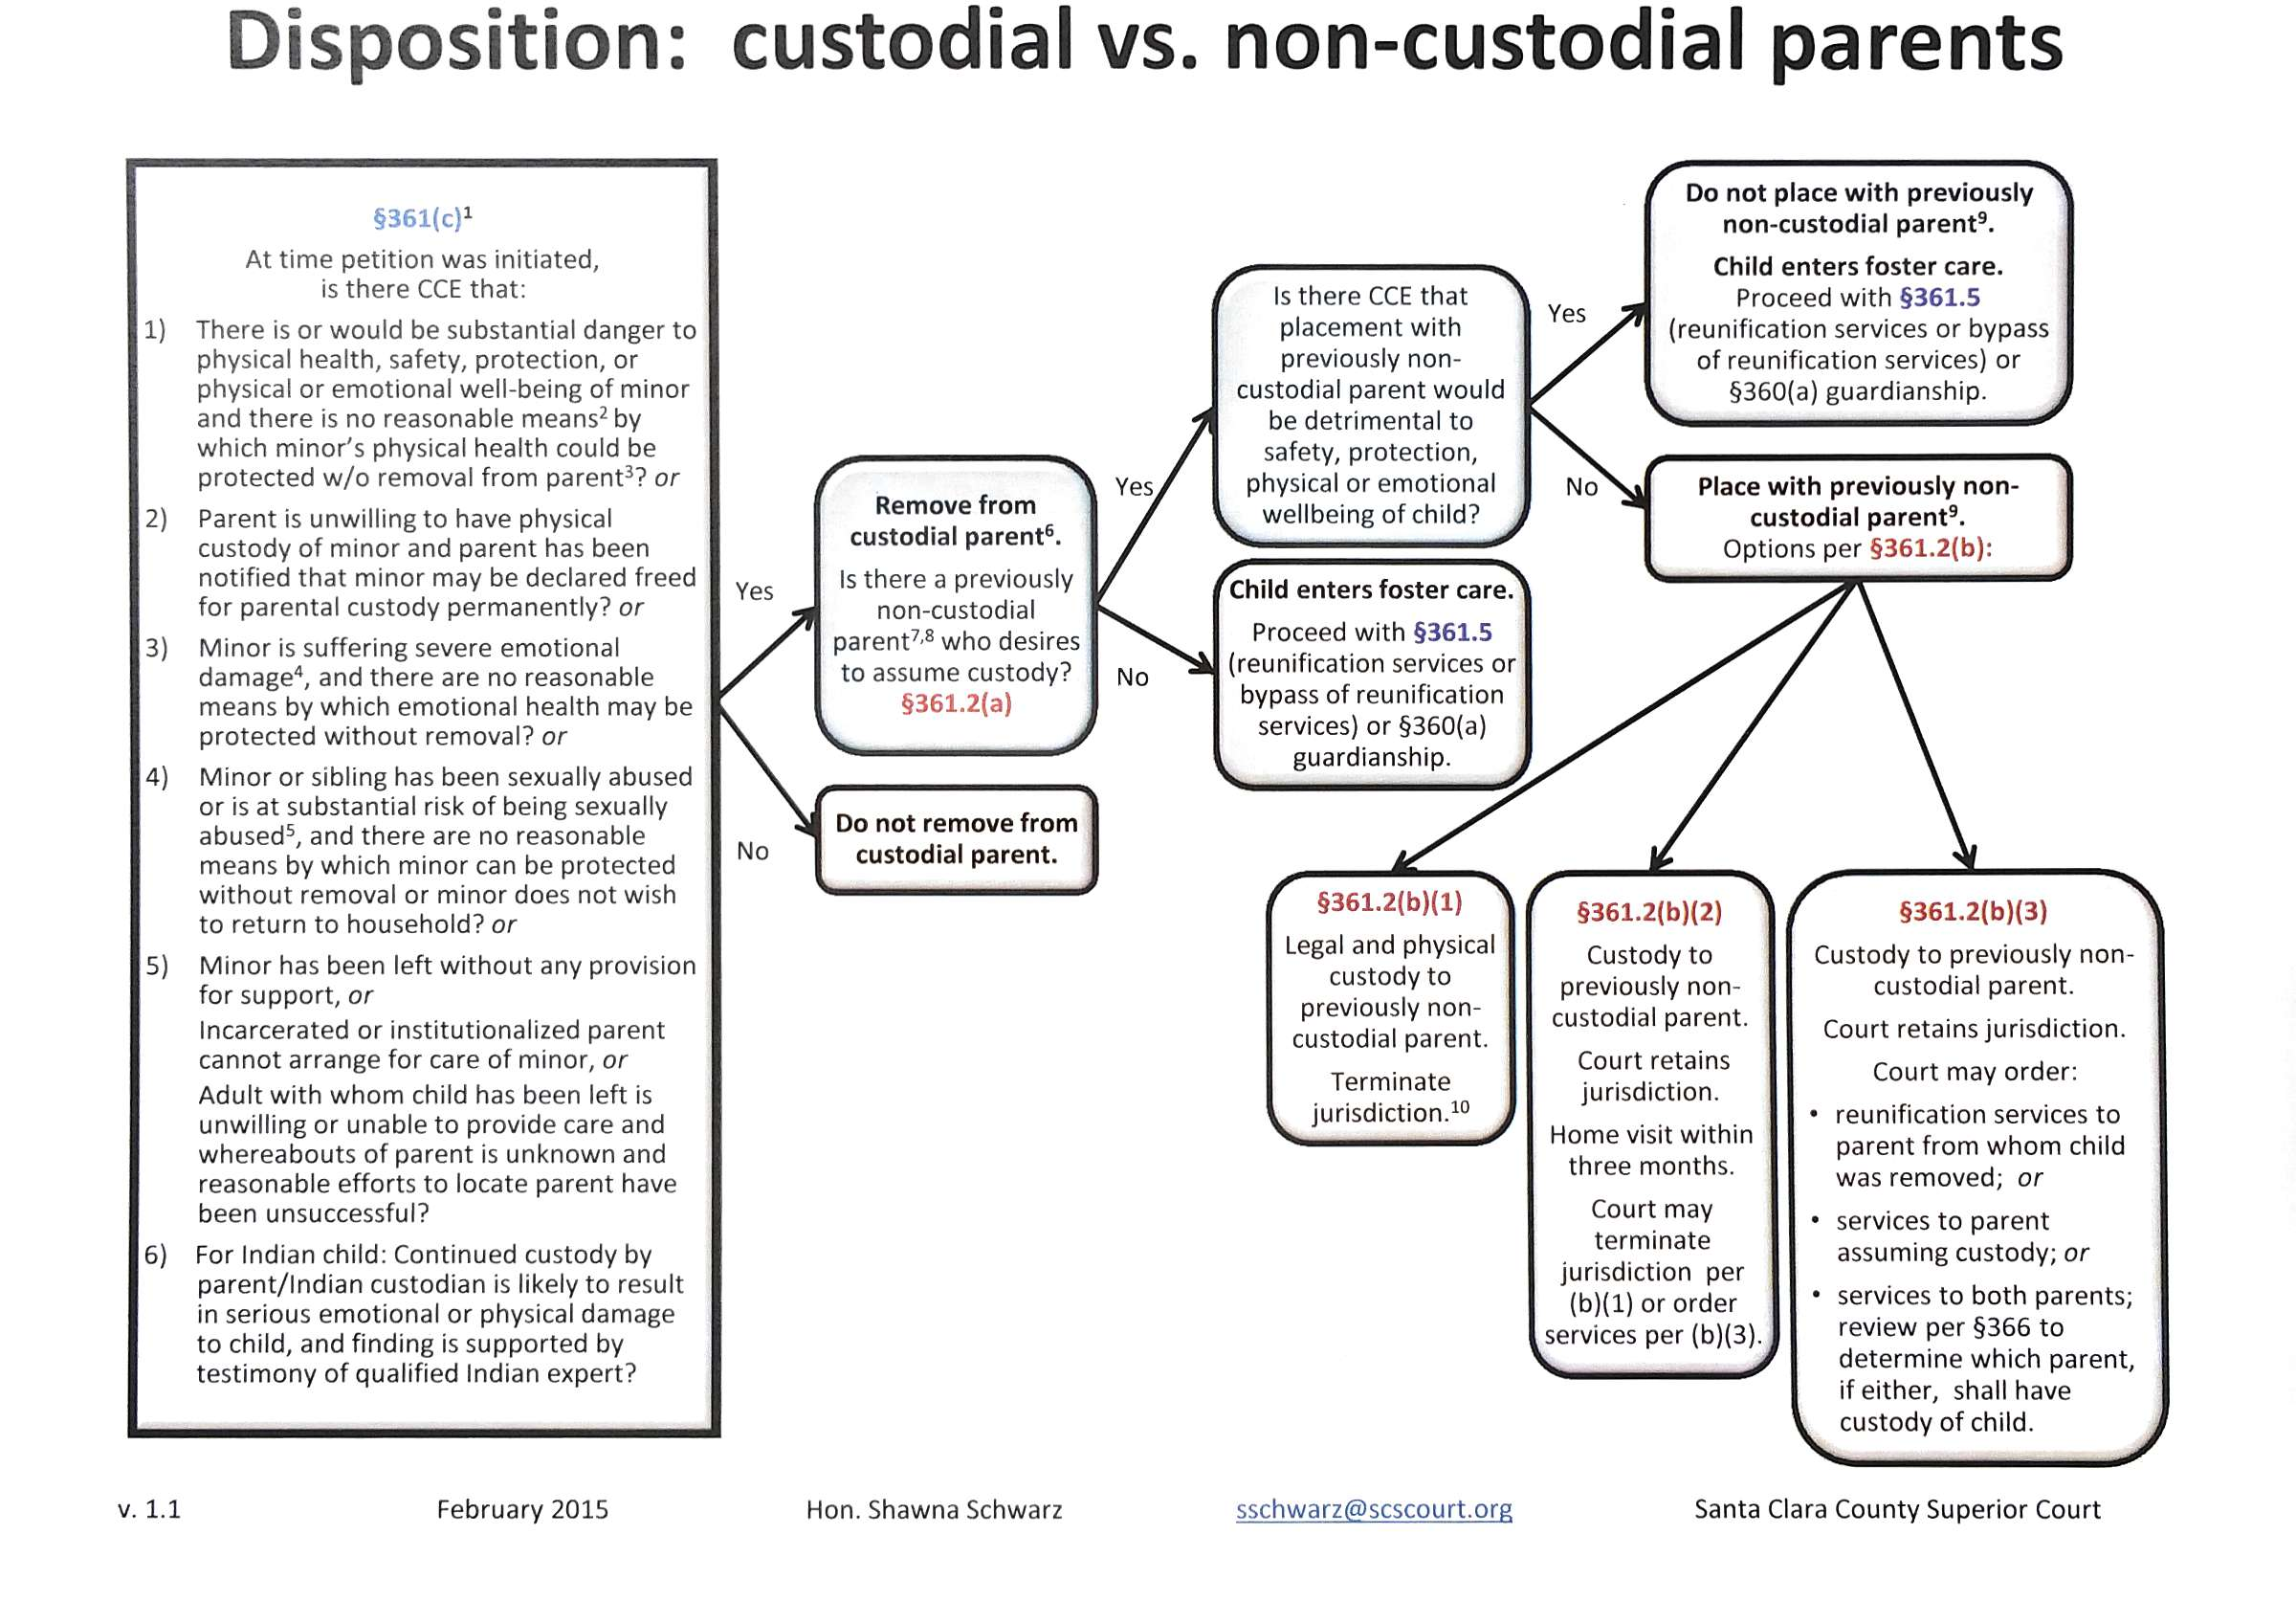 Family law chart: Disposition - custodial vs non-custodial